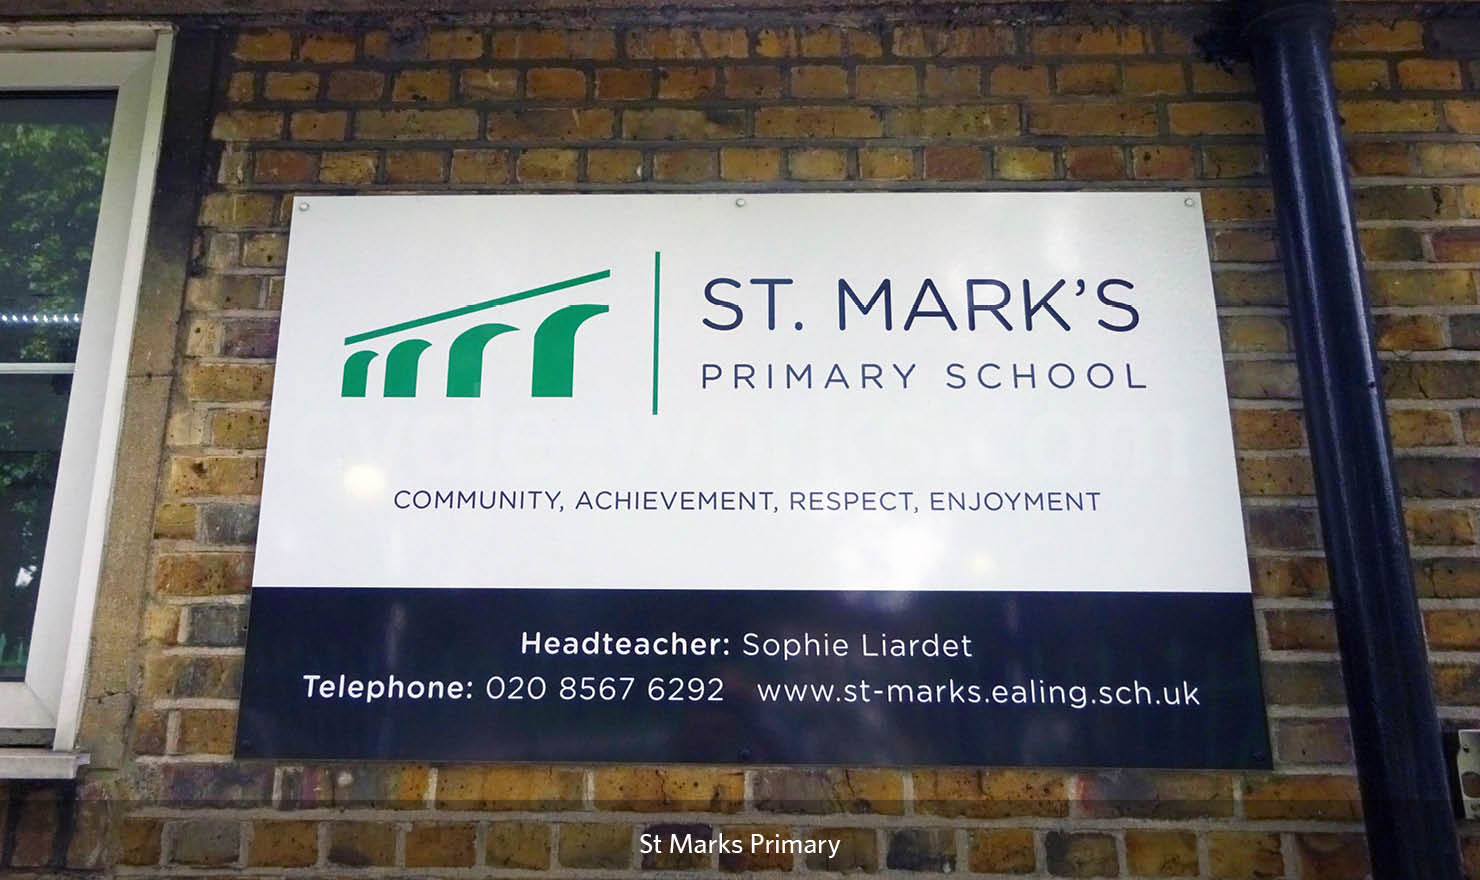 Solent Bike Shelter at St Marks Primary School in Ealing